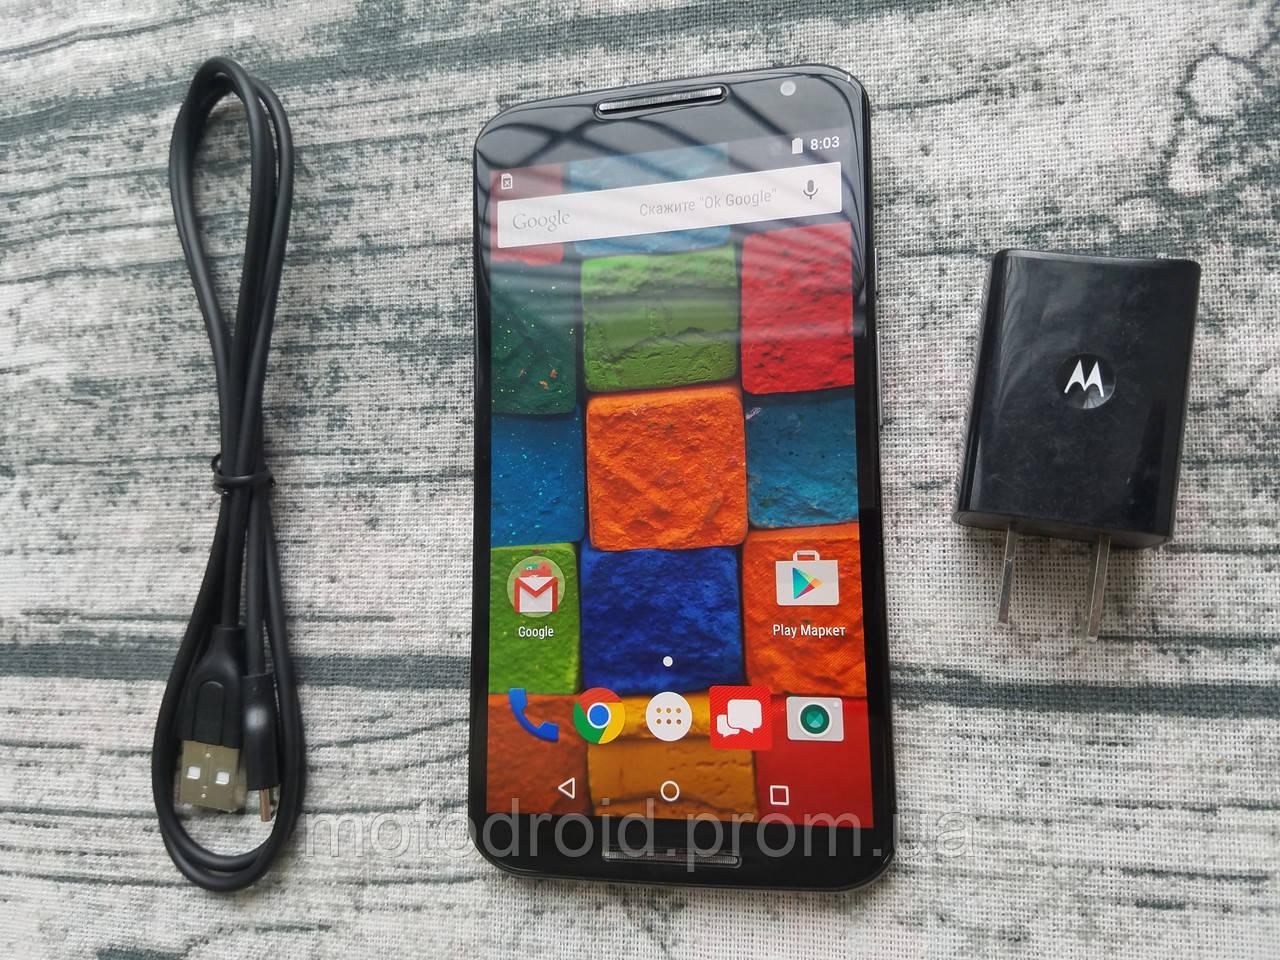 Смартфон Motorola Moto X 2nd Gen (xt 1097) 16 Gb